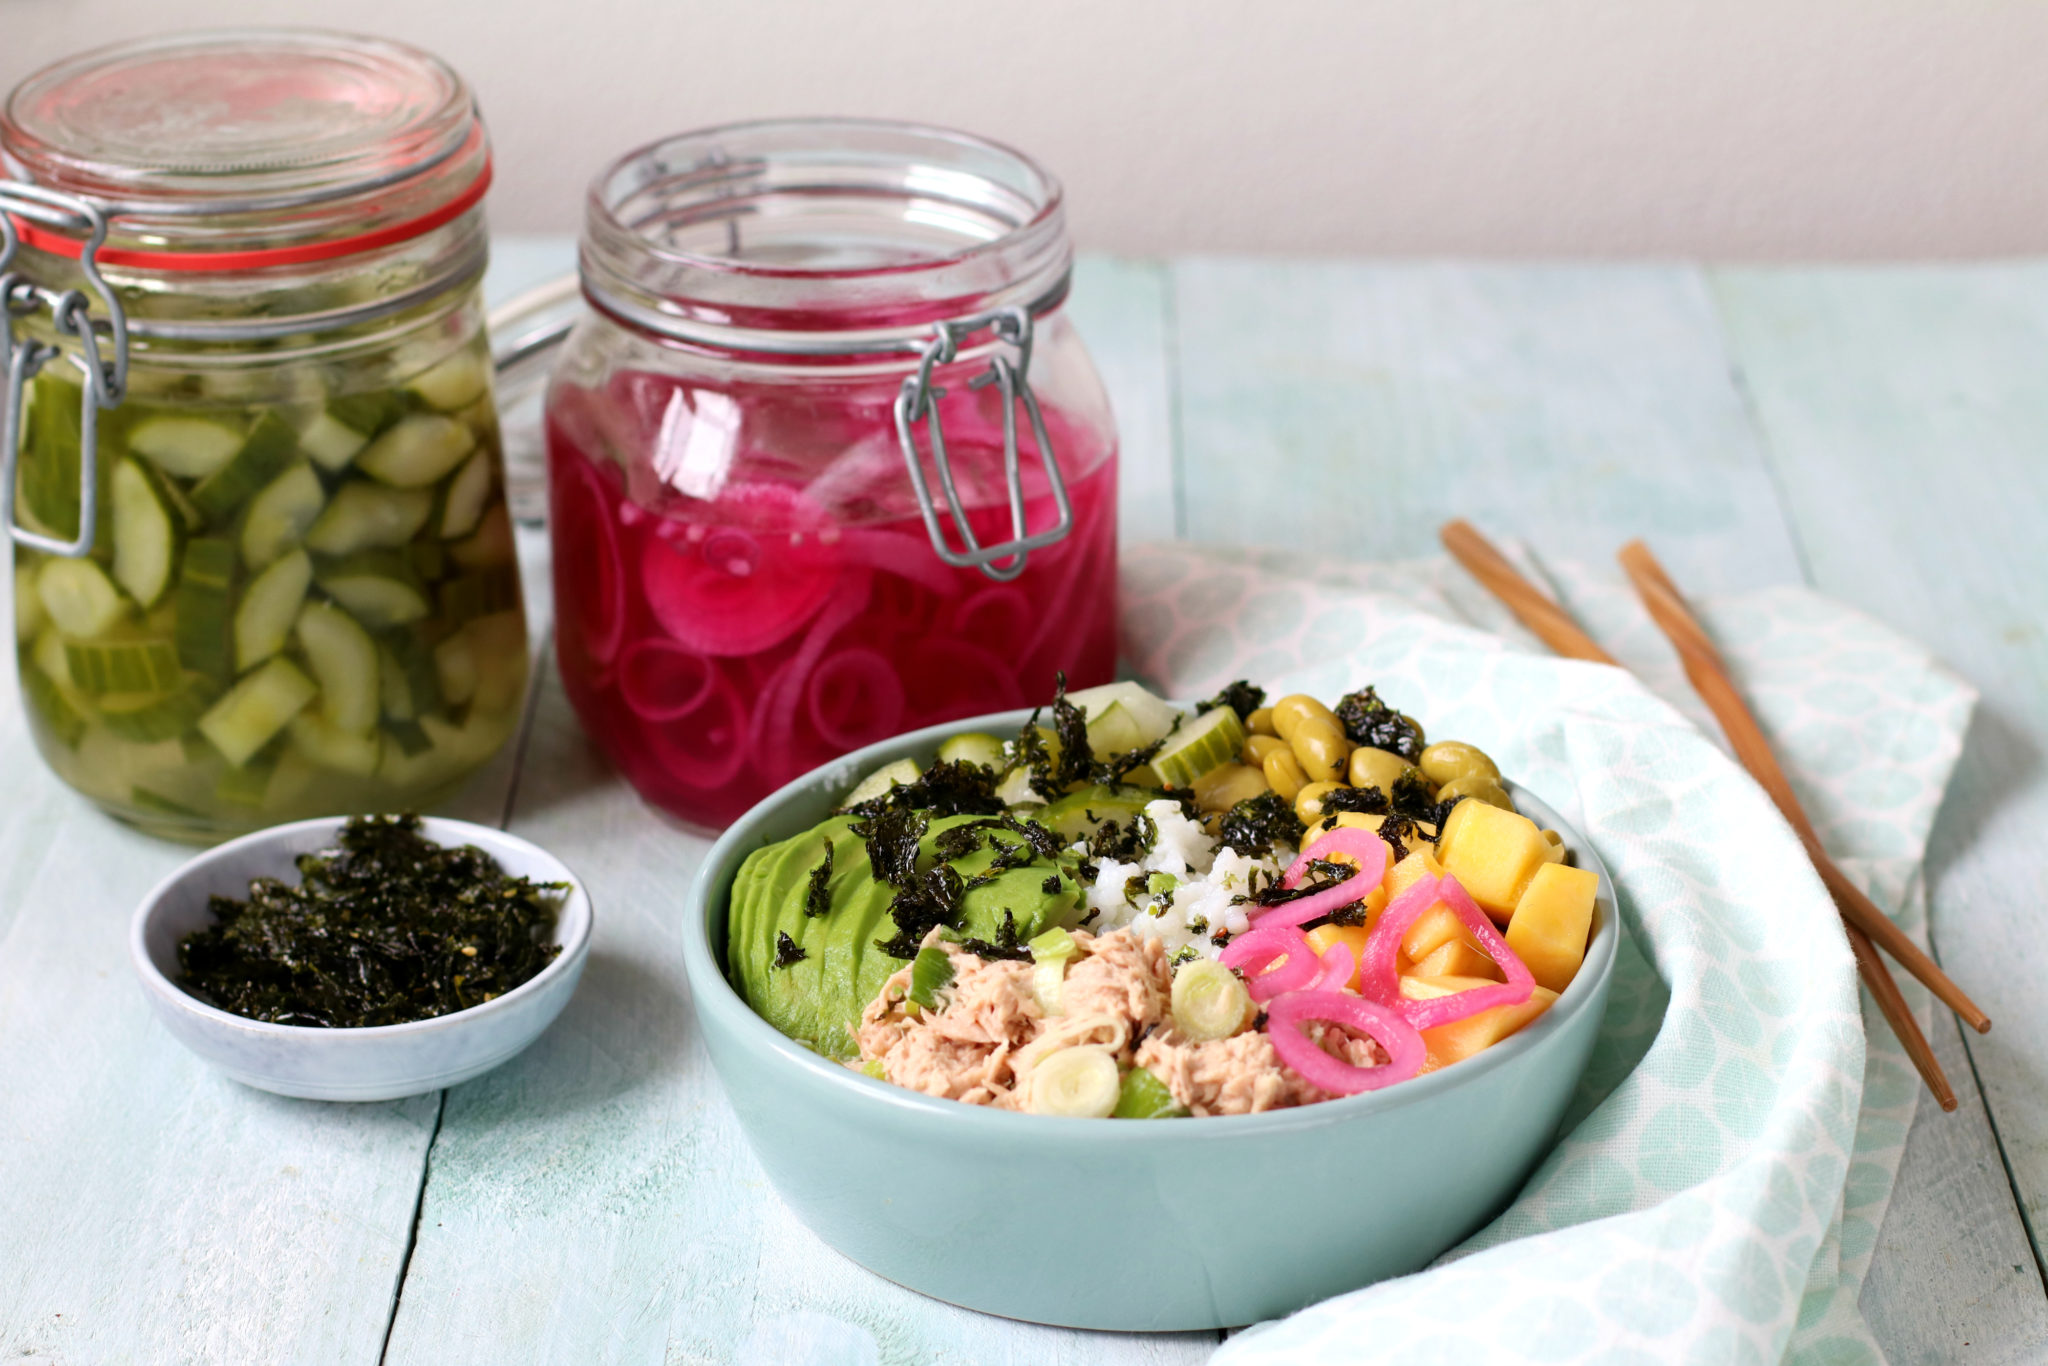 Recept pittige tonijn sushibowl www.jaimyskitchen.nl